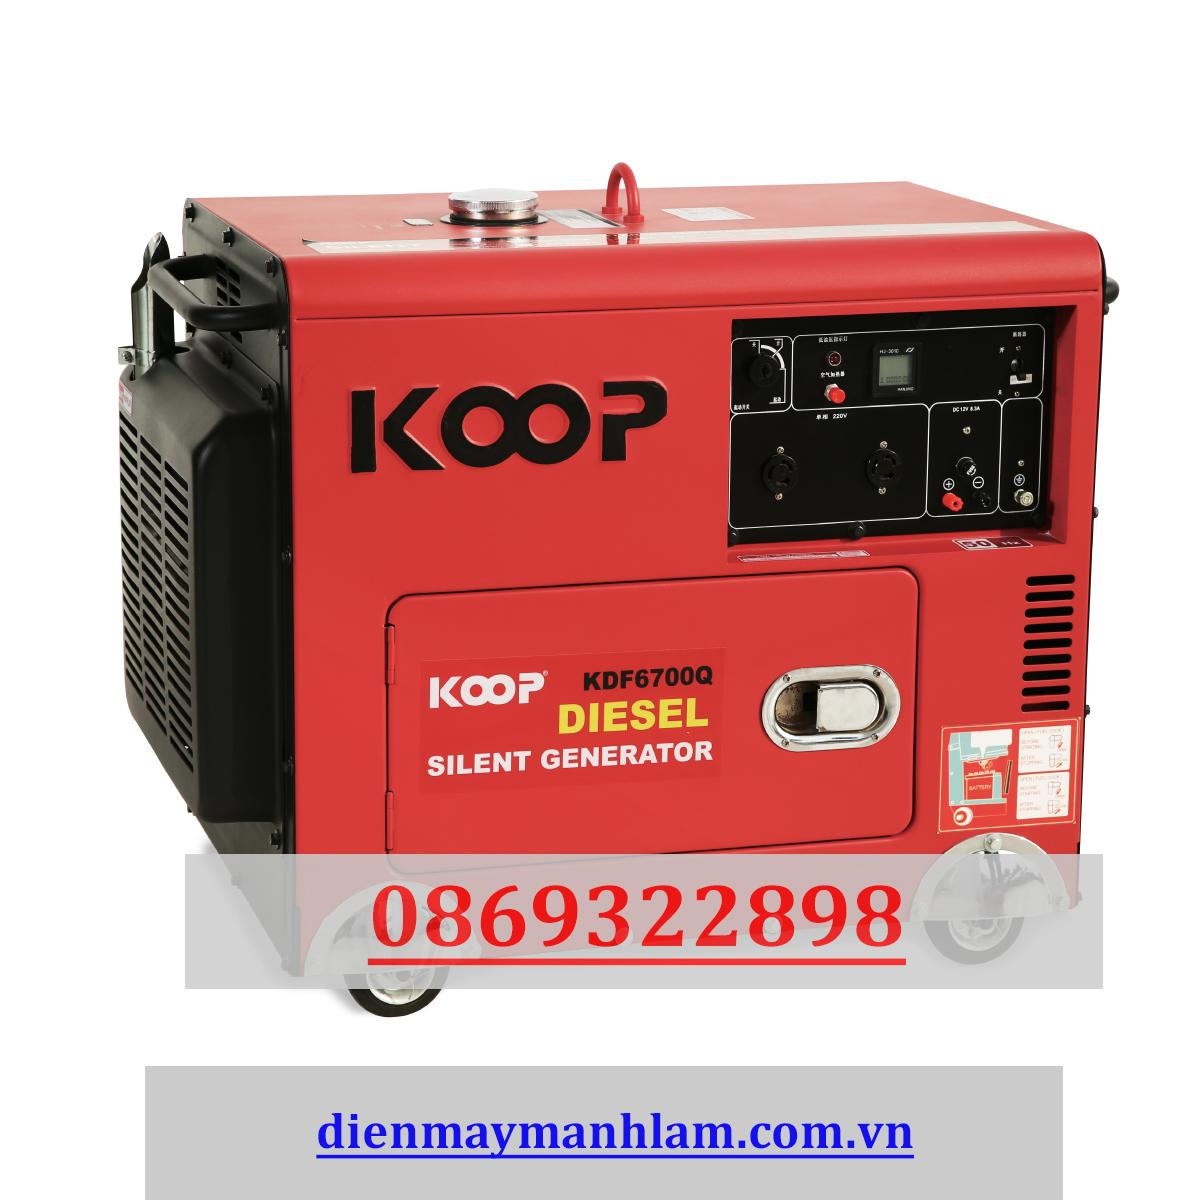 Máy phát điện nhật bản Koop 5.0kw KDF 6700Q